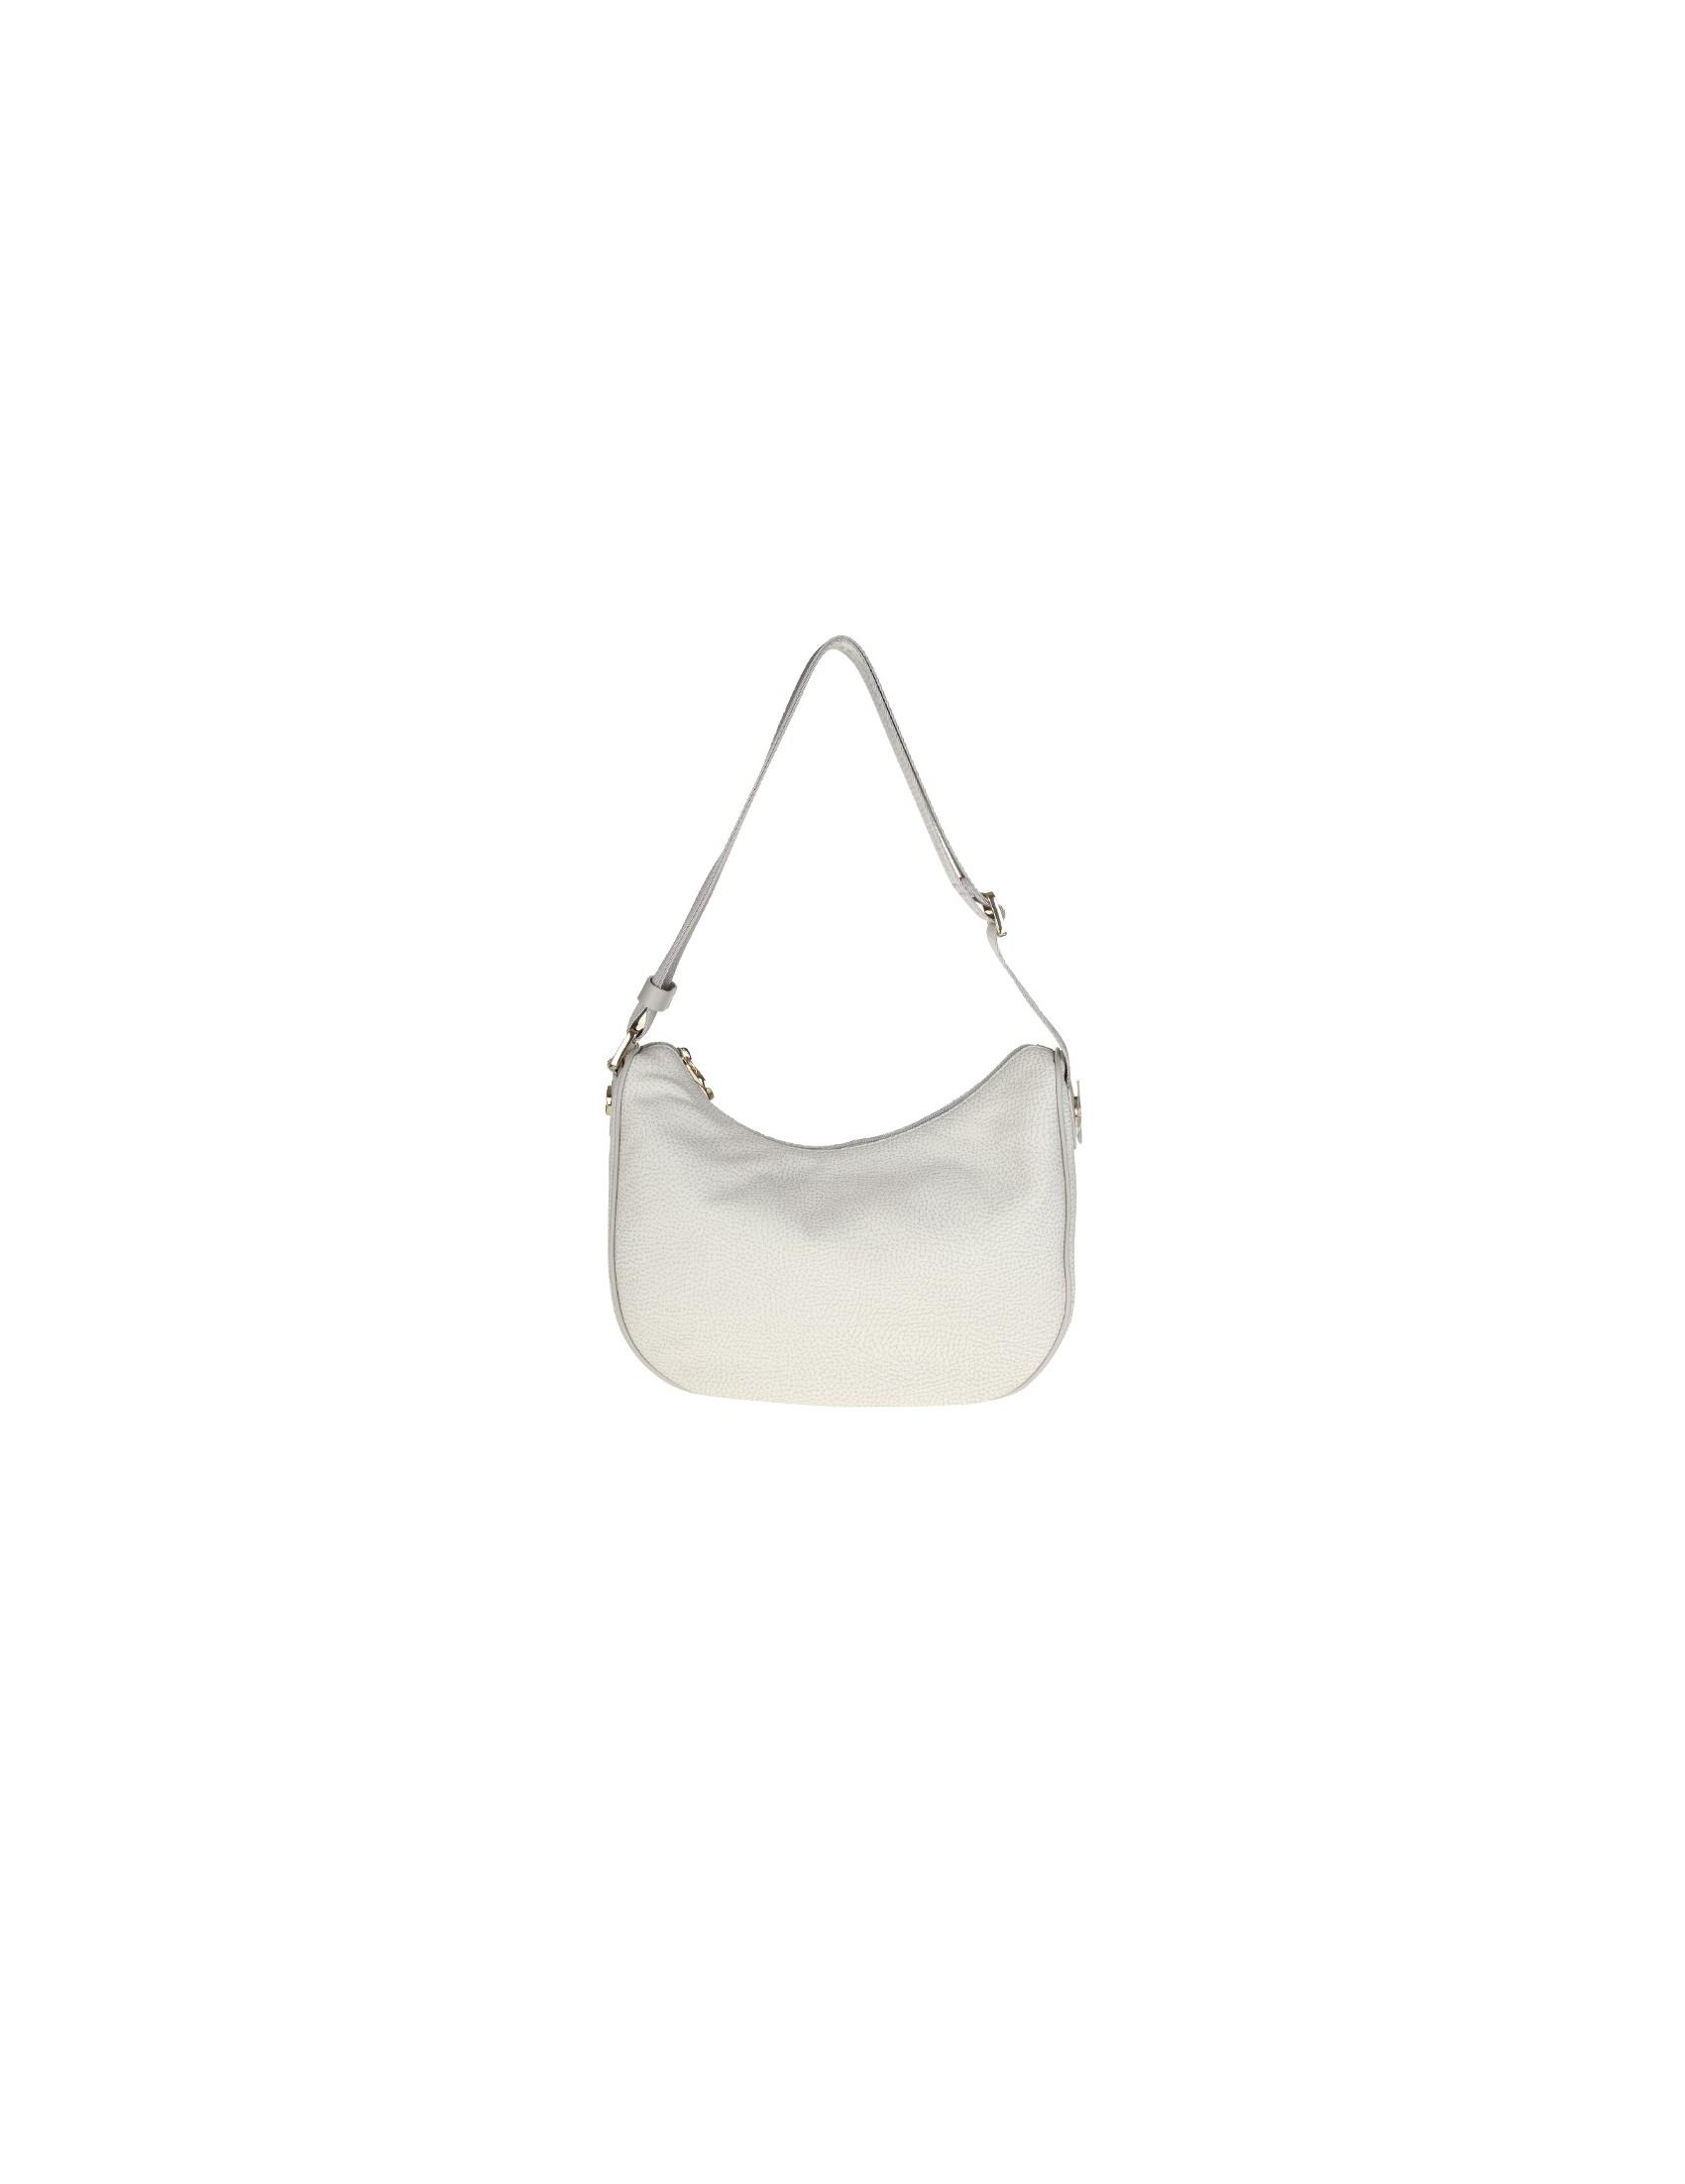 Borbonese White leather shoulder bag 5hFpunWfWz